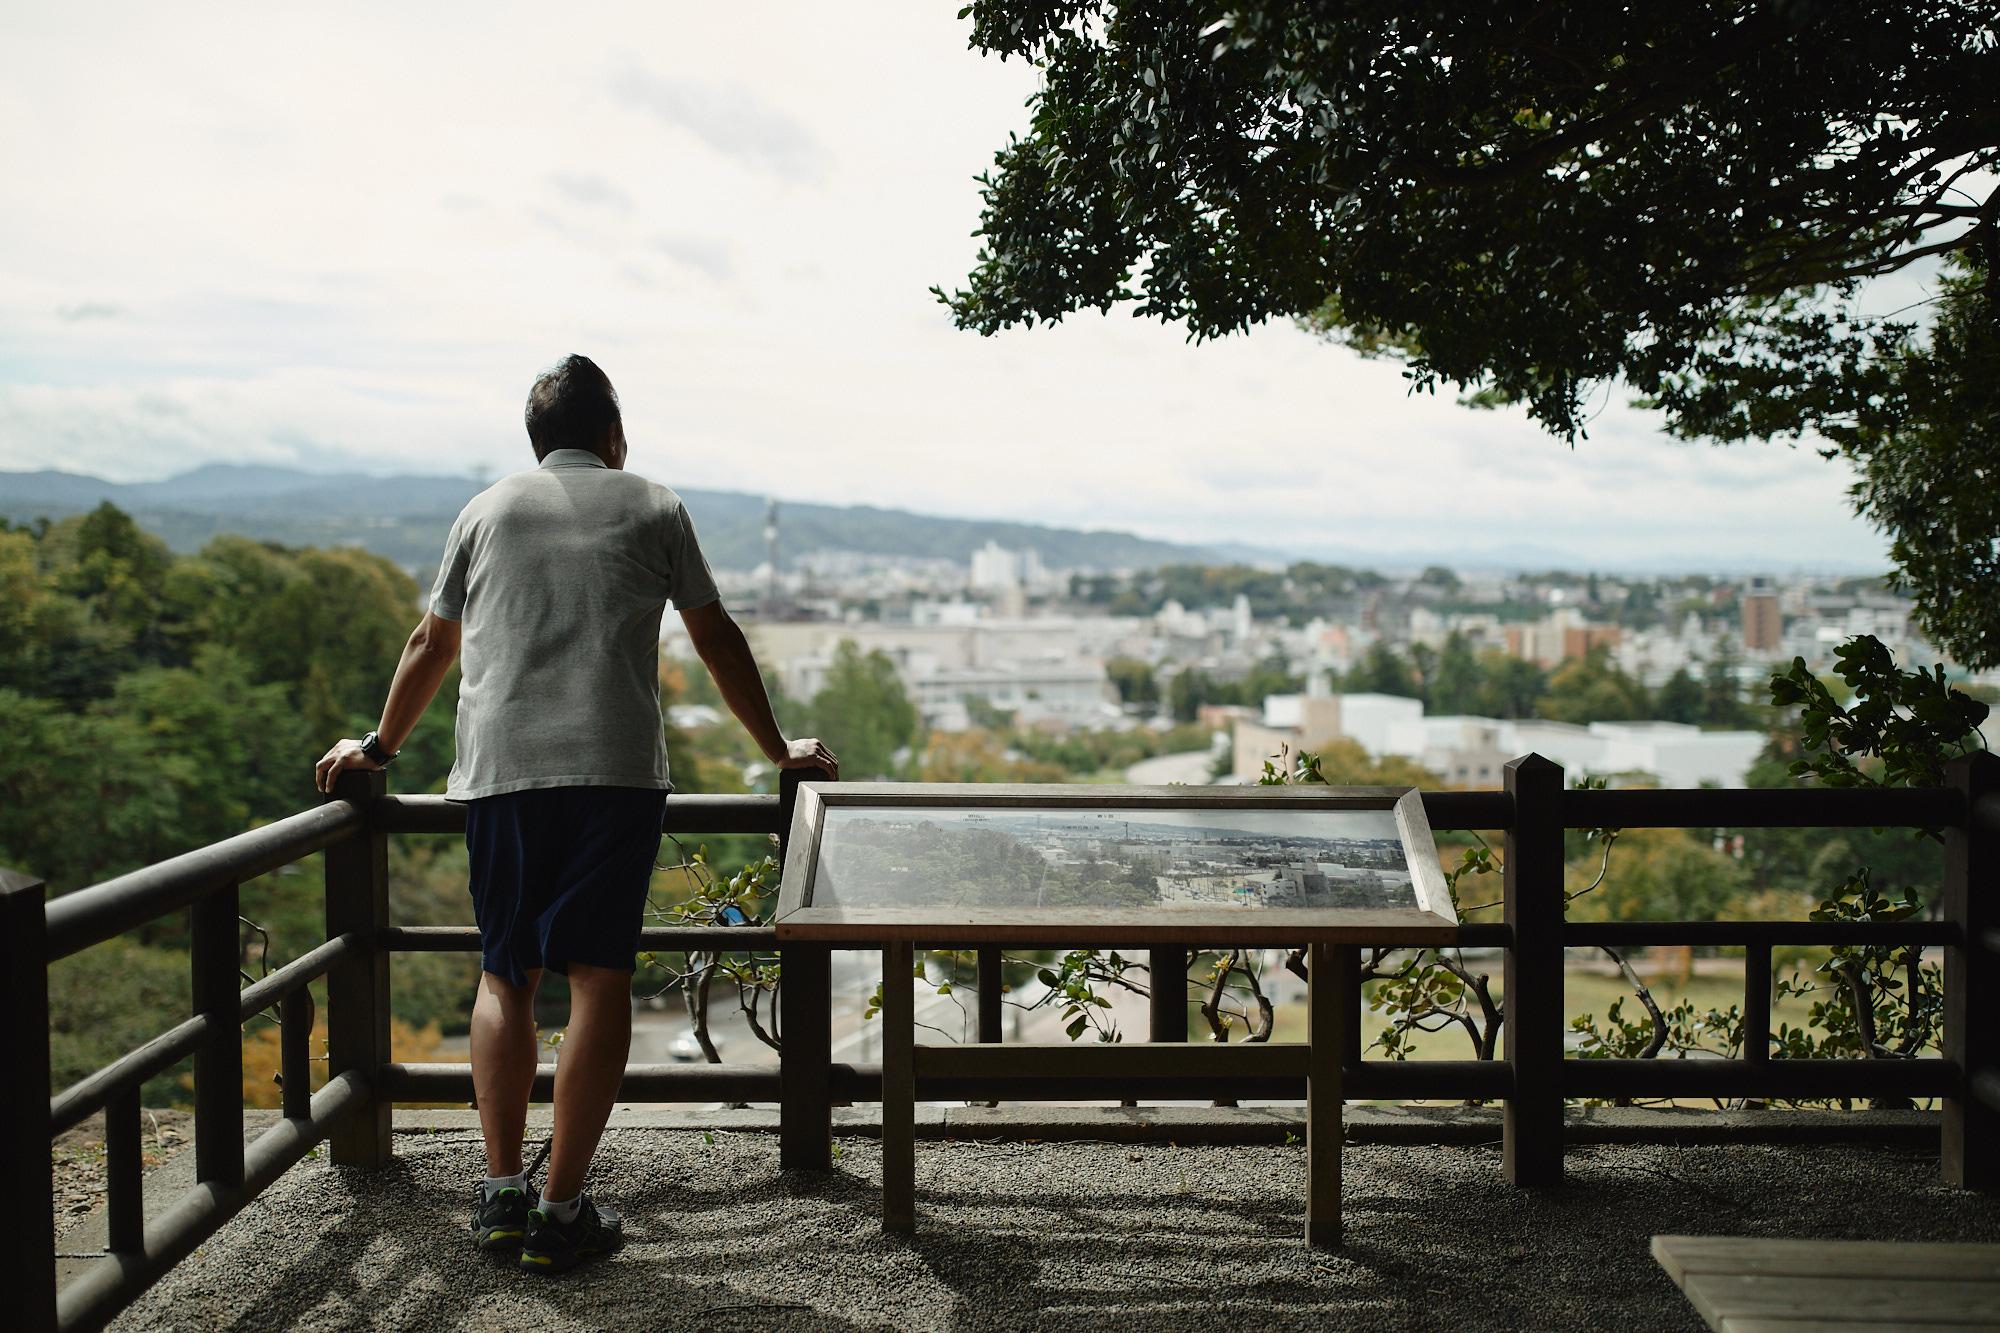 Tatsumi Yagura viewpoint